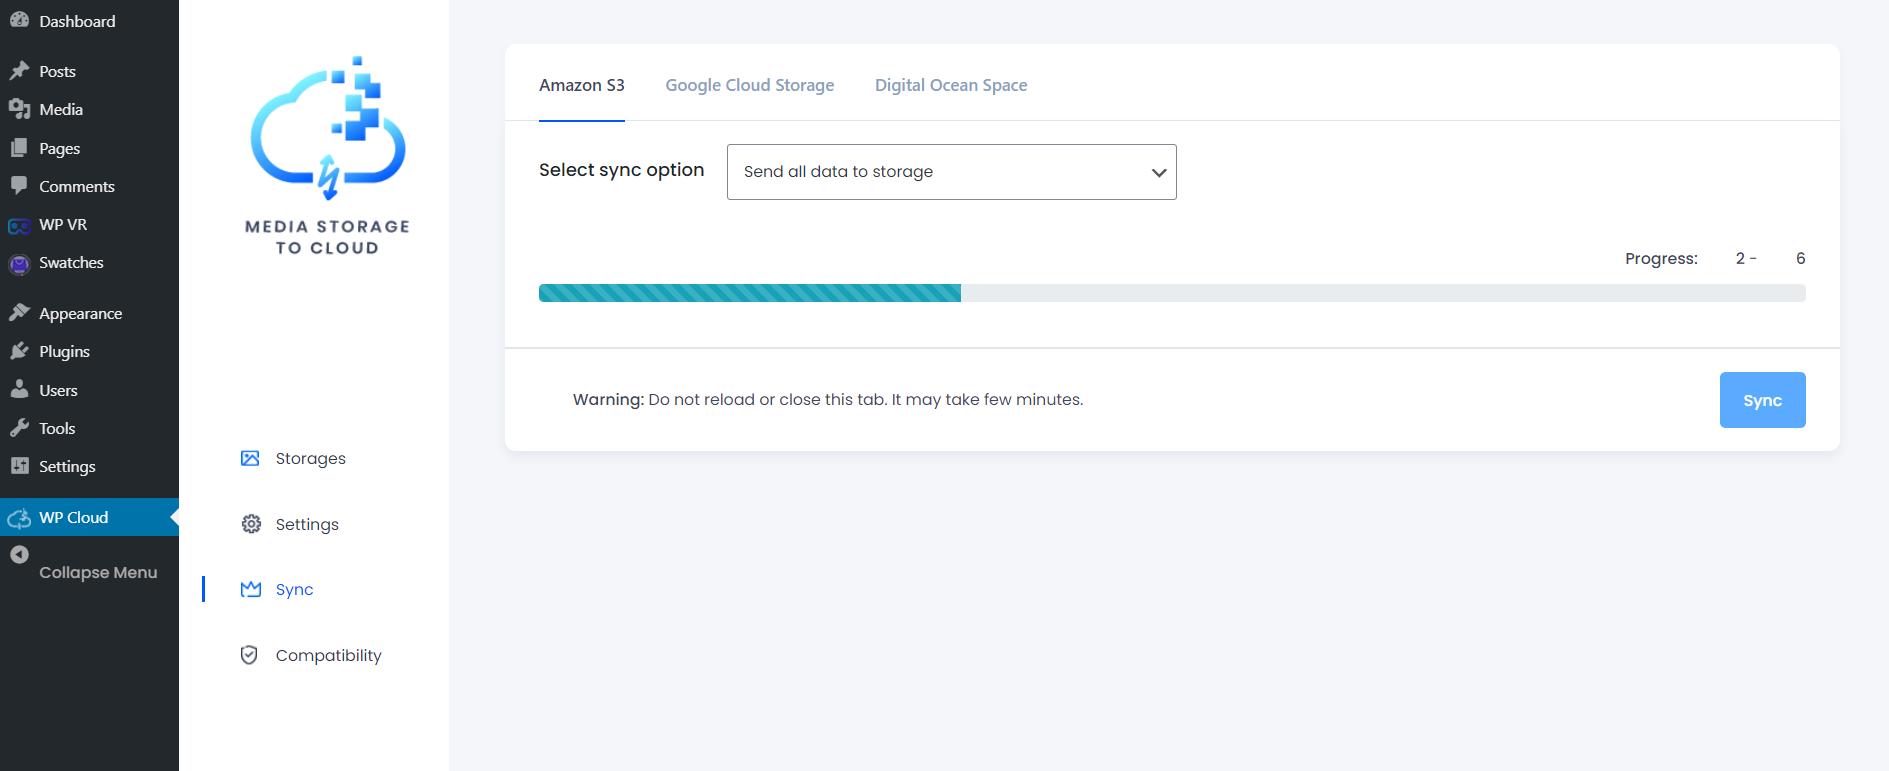 Syncing Media Files To Amazon S3 Bucket